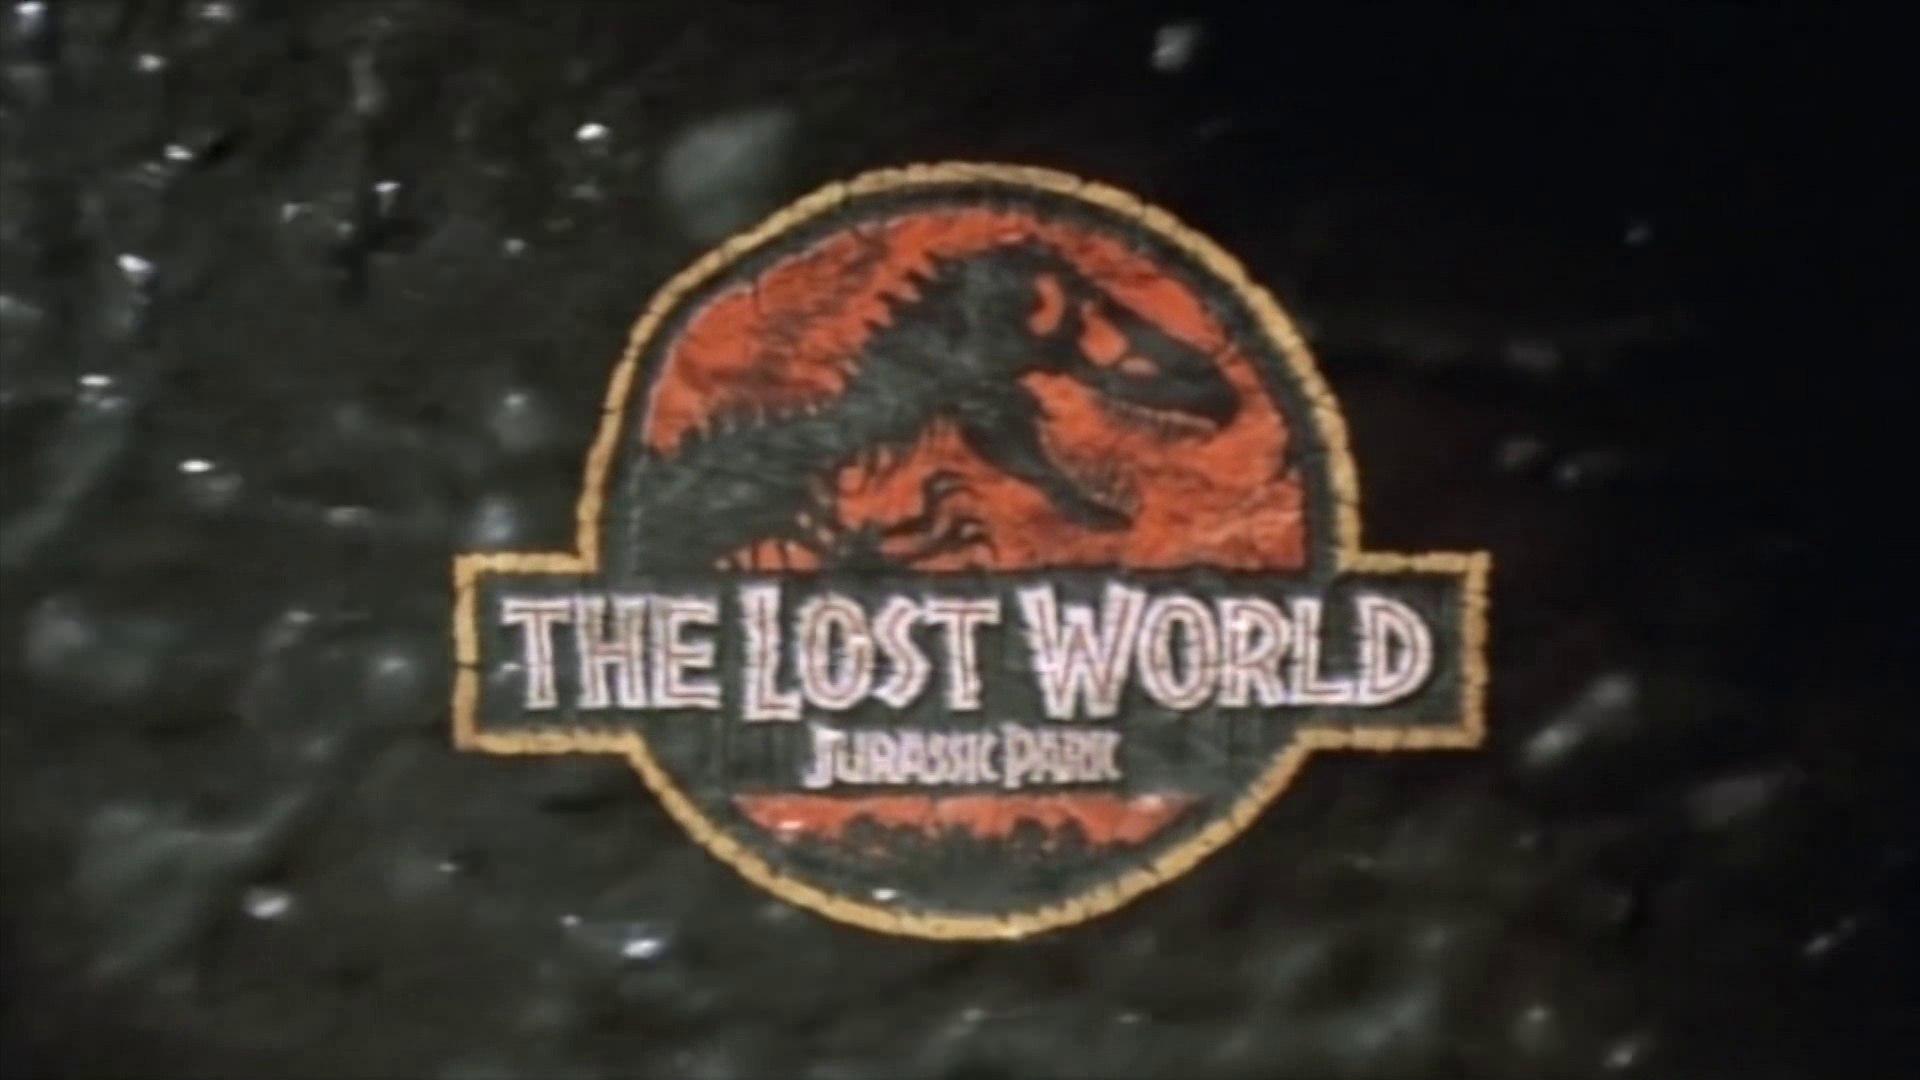 JURASSIC PARK 2: The Lost World (1997) Trailer - HQ